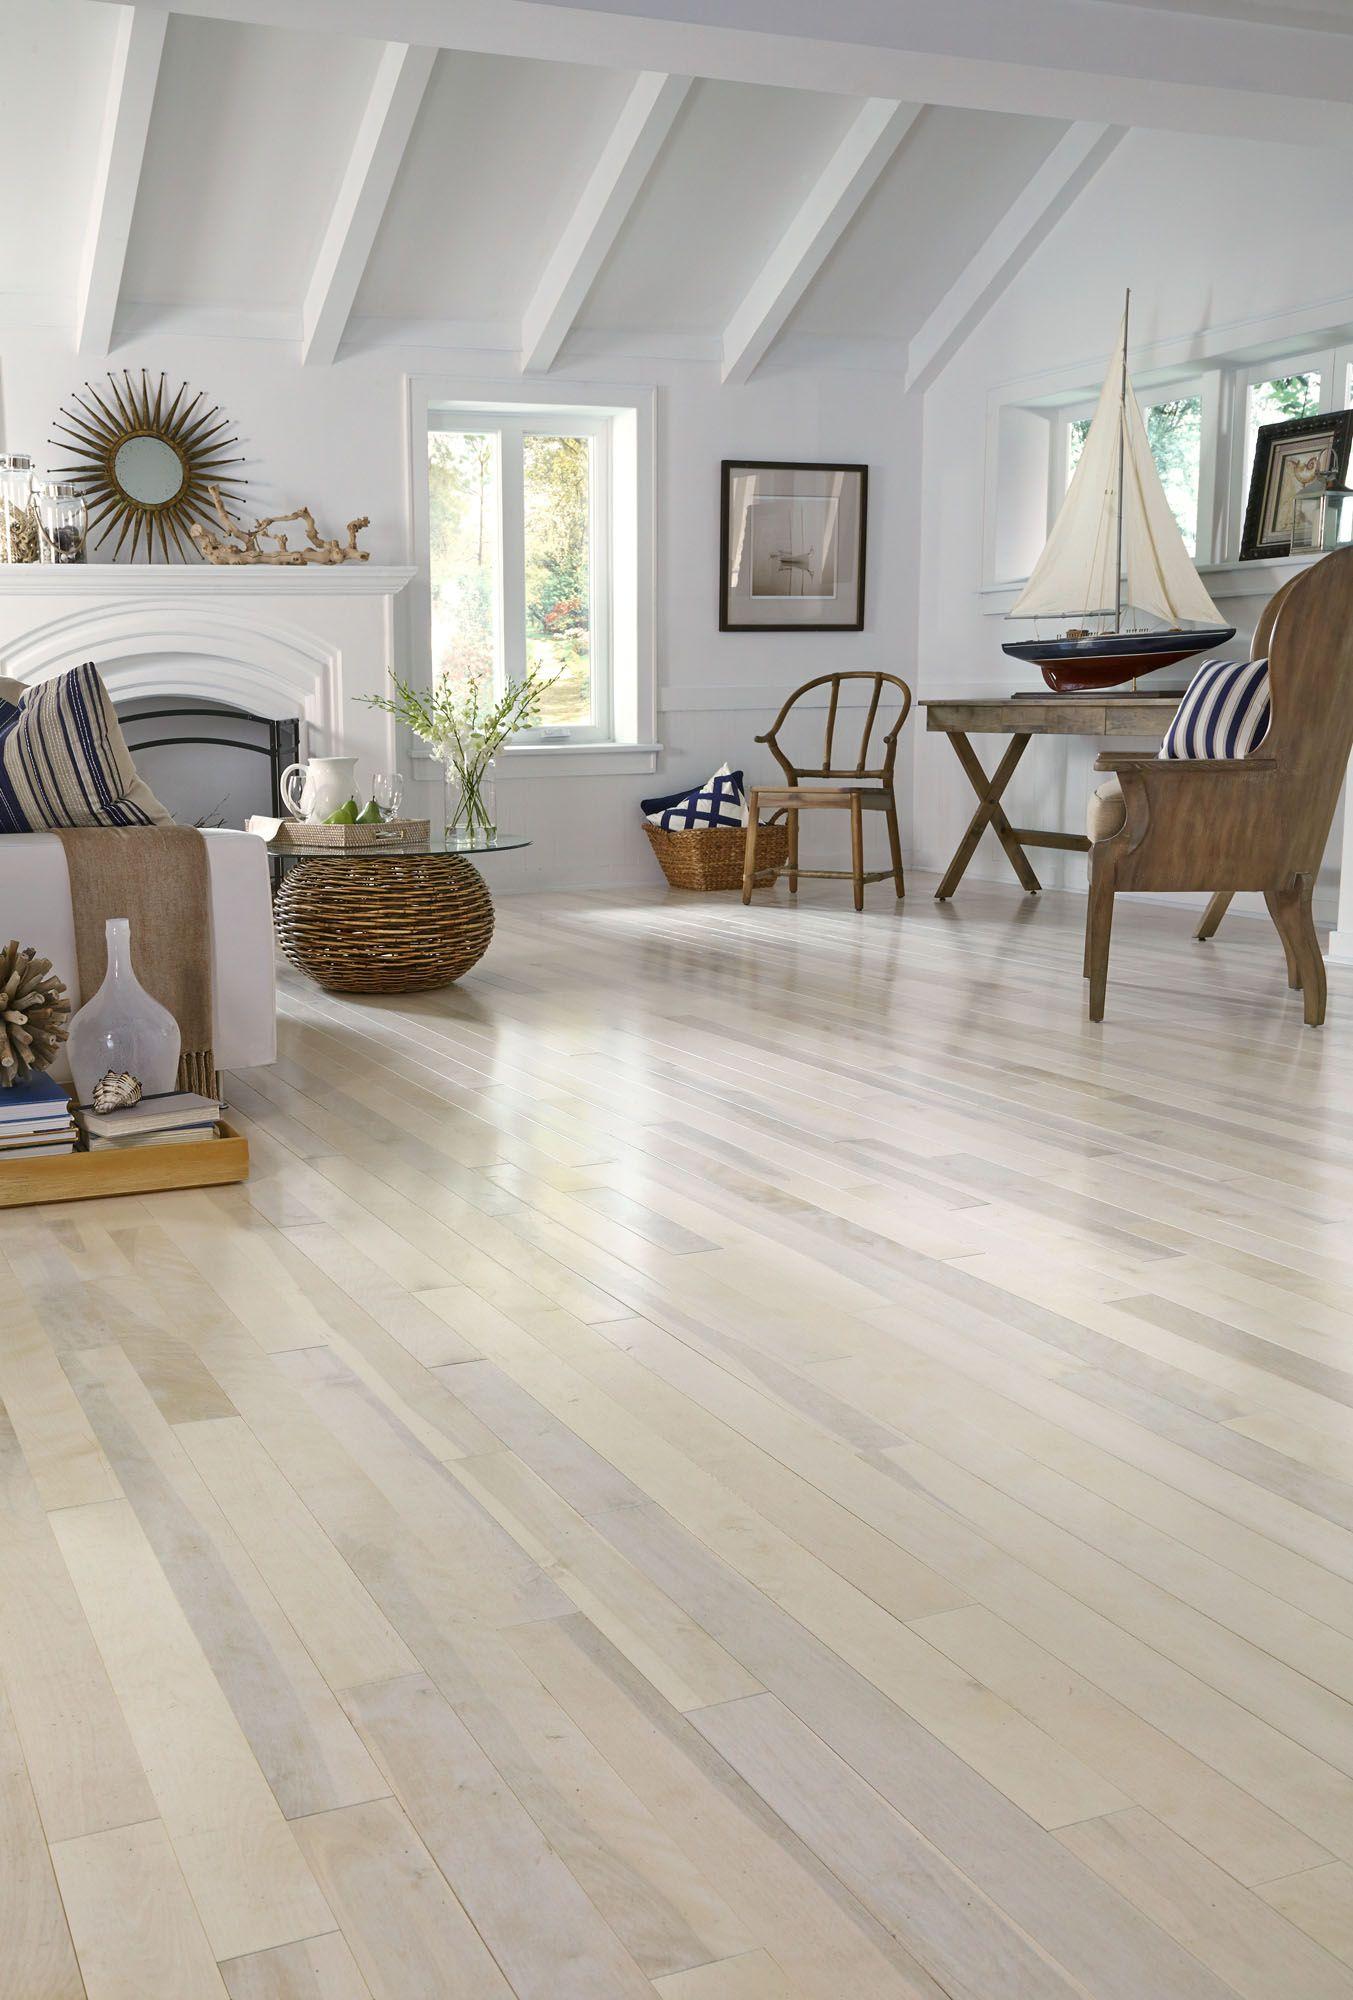 Farmhouse White Birch is light & bright perfect to open